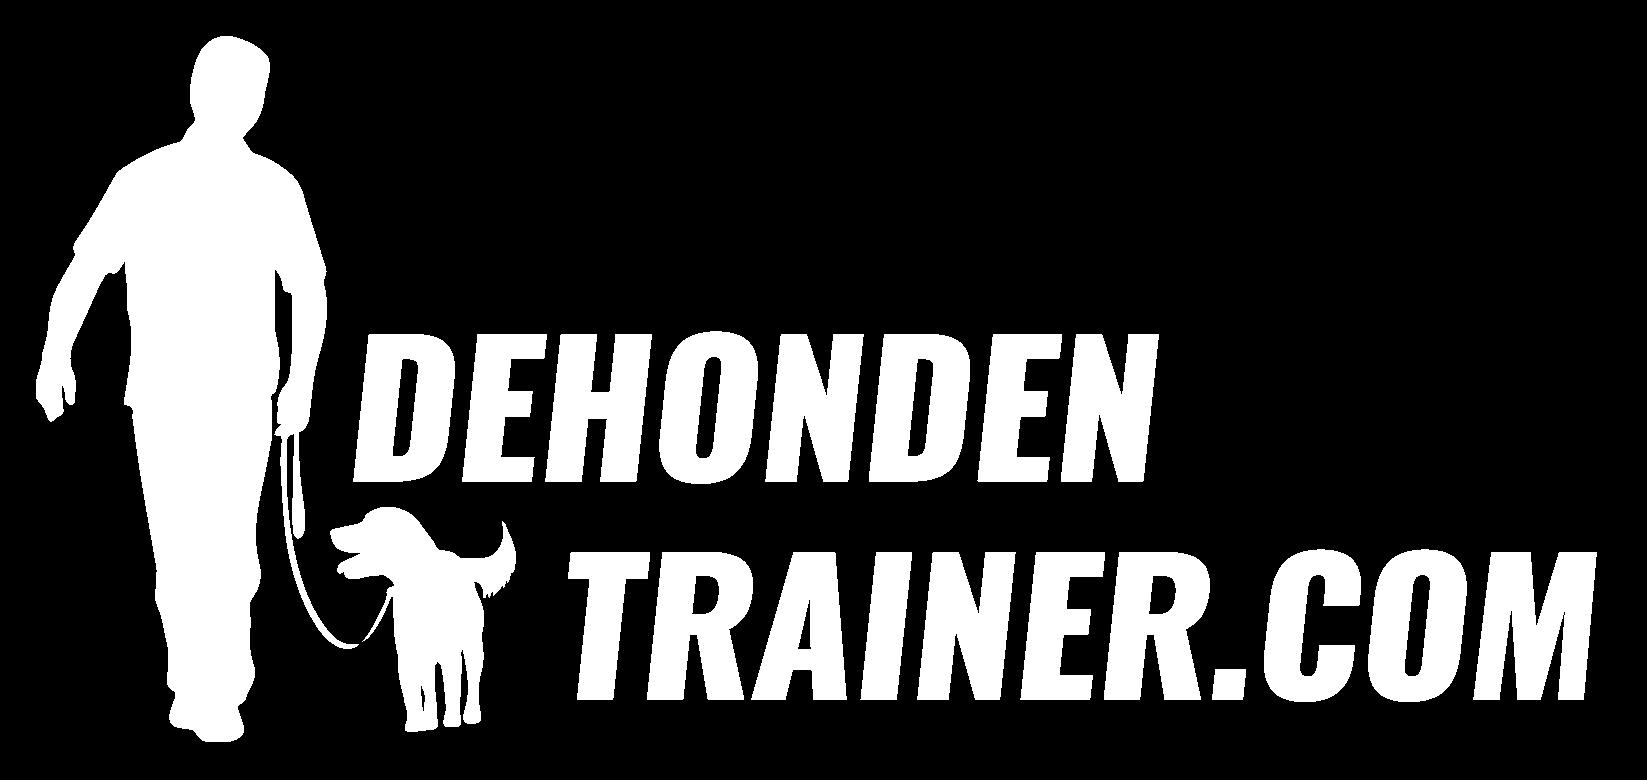 DeHondentrainer.com - Wouter de Vries